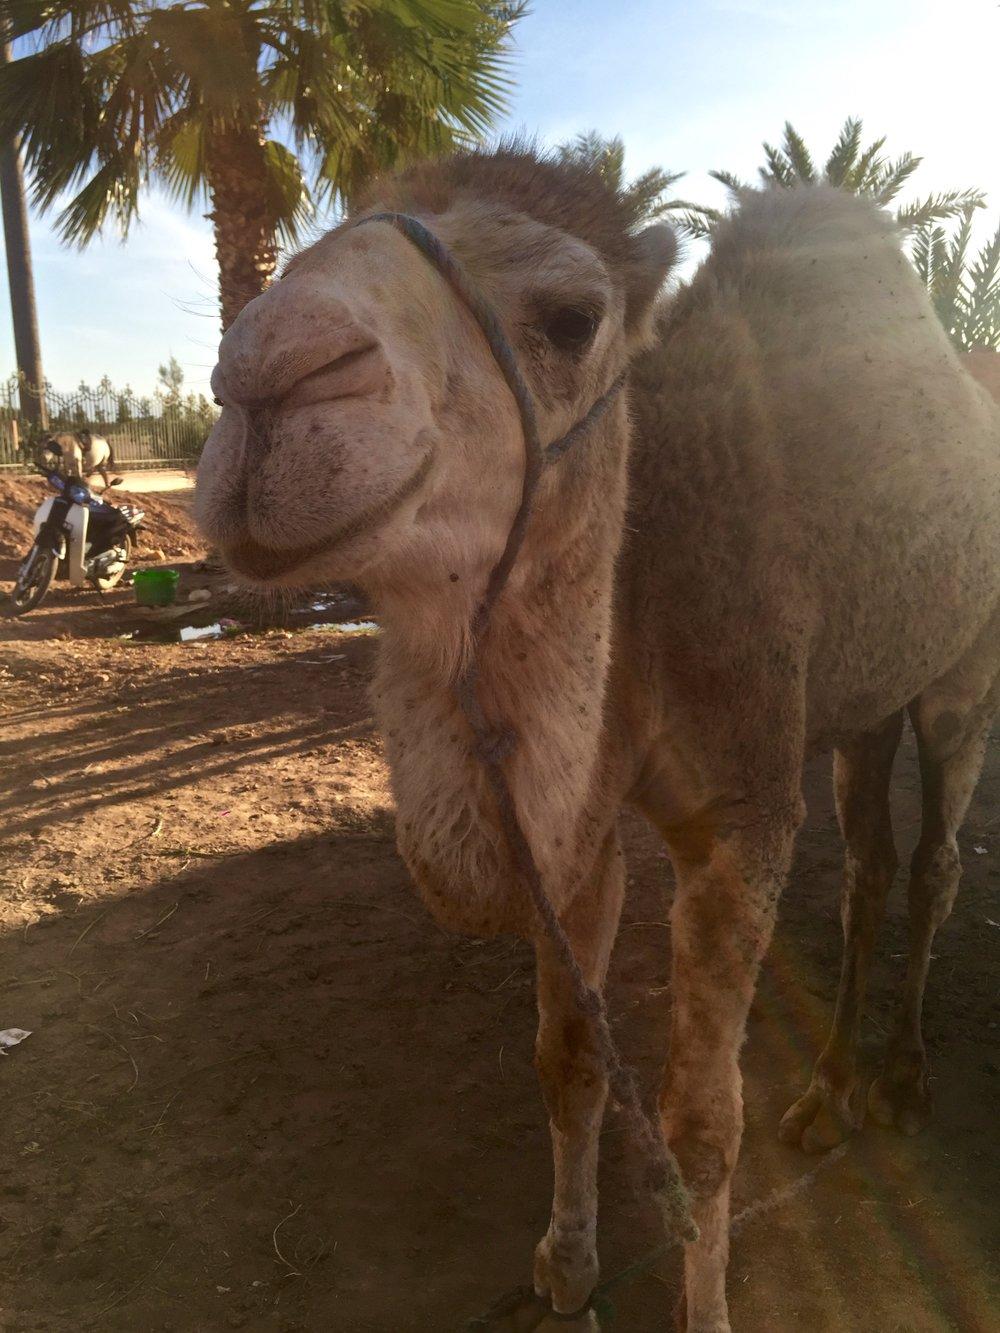 My new camel friend